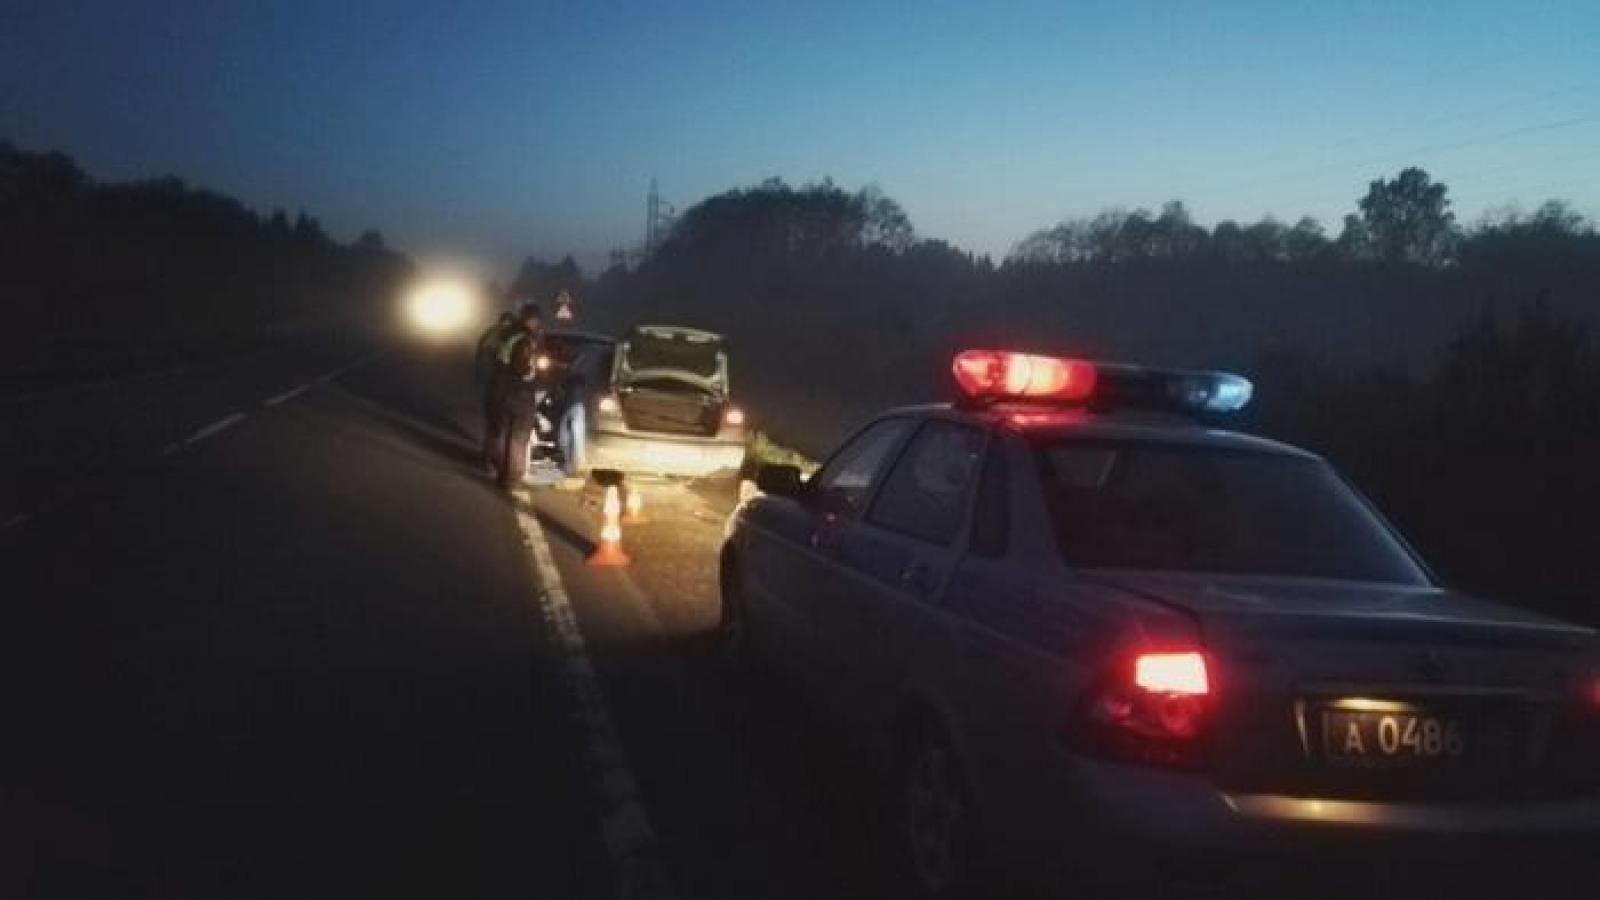 Сотрудники ГИБДД помогли водителю, пробившему колесо